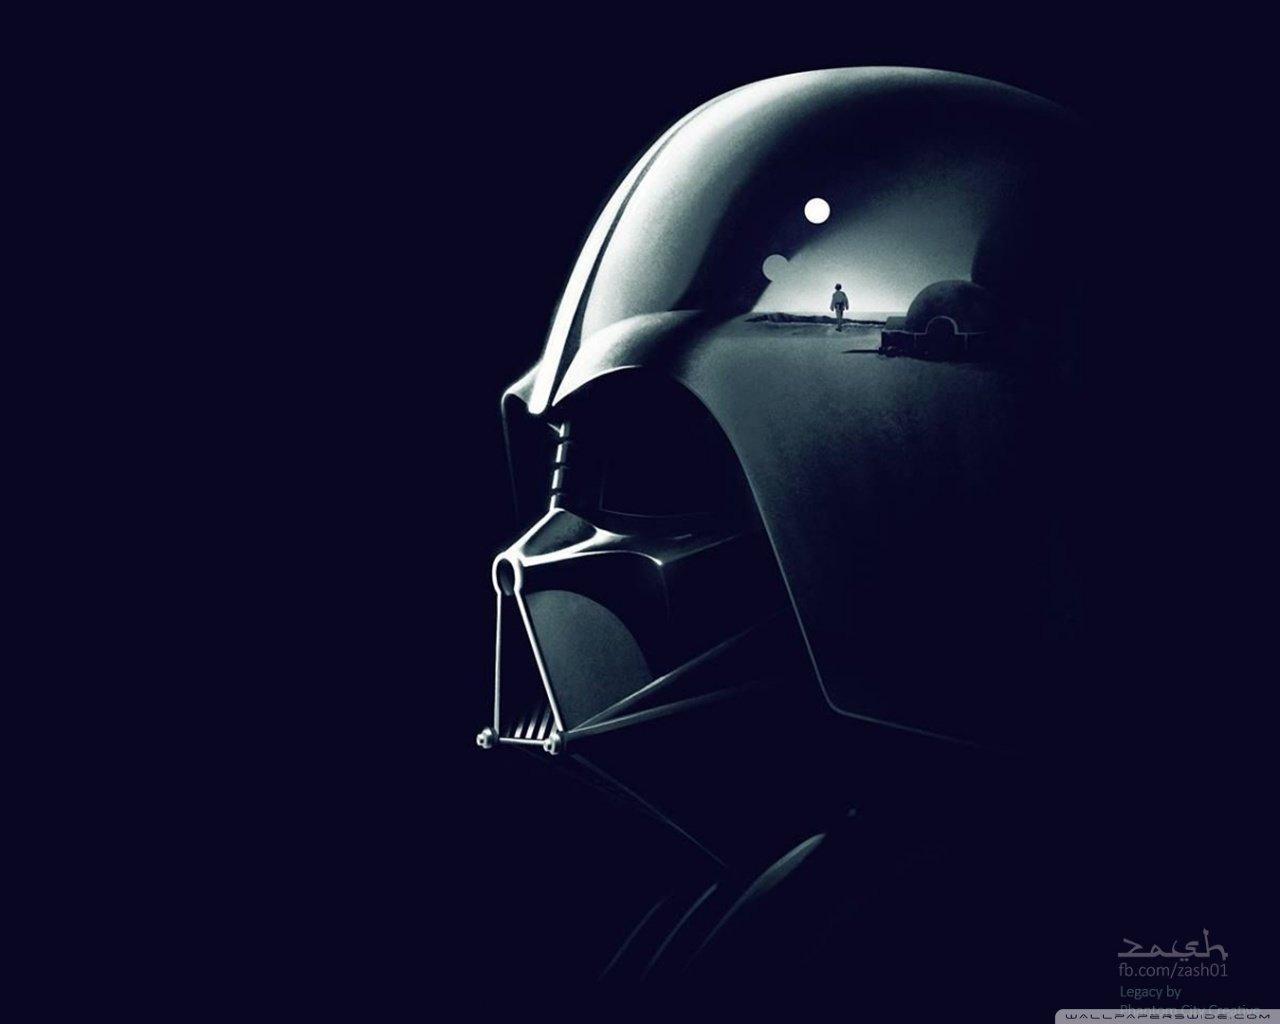 Dark Star Wars Wallpapers Top Free Dark Star Wars Backgrounds Wallpaperaccess